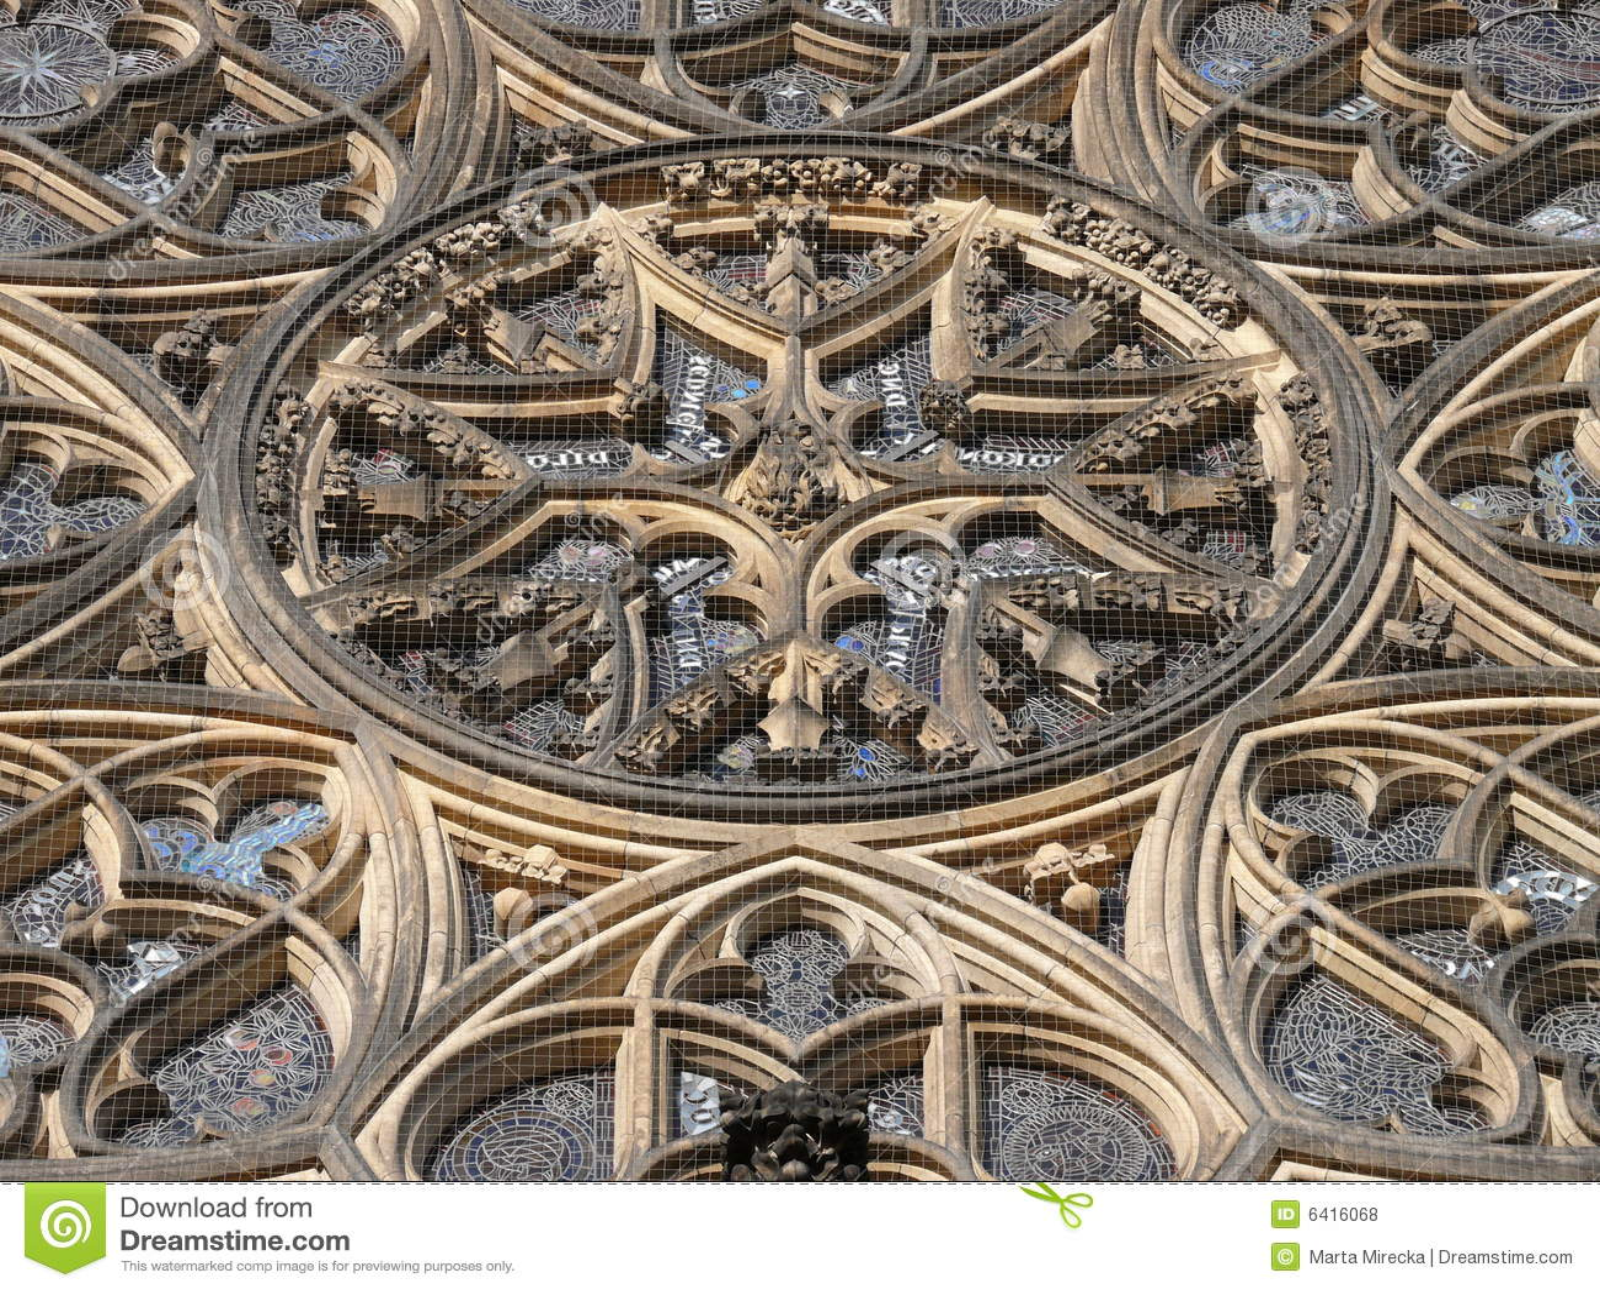 Rosetón de la catedral del St Vitus. Praga